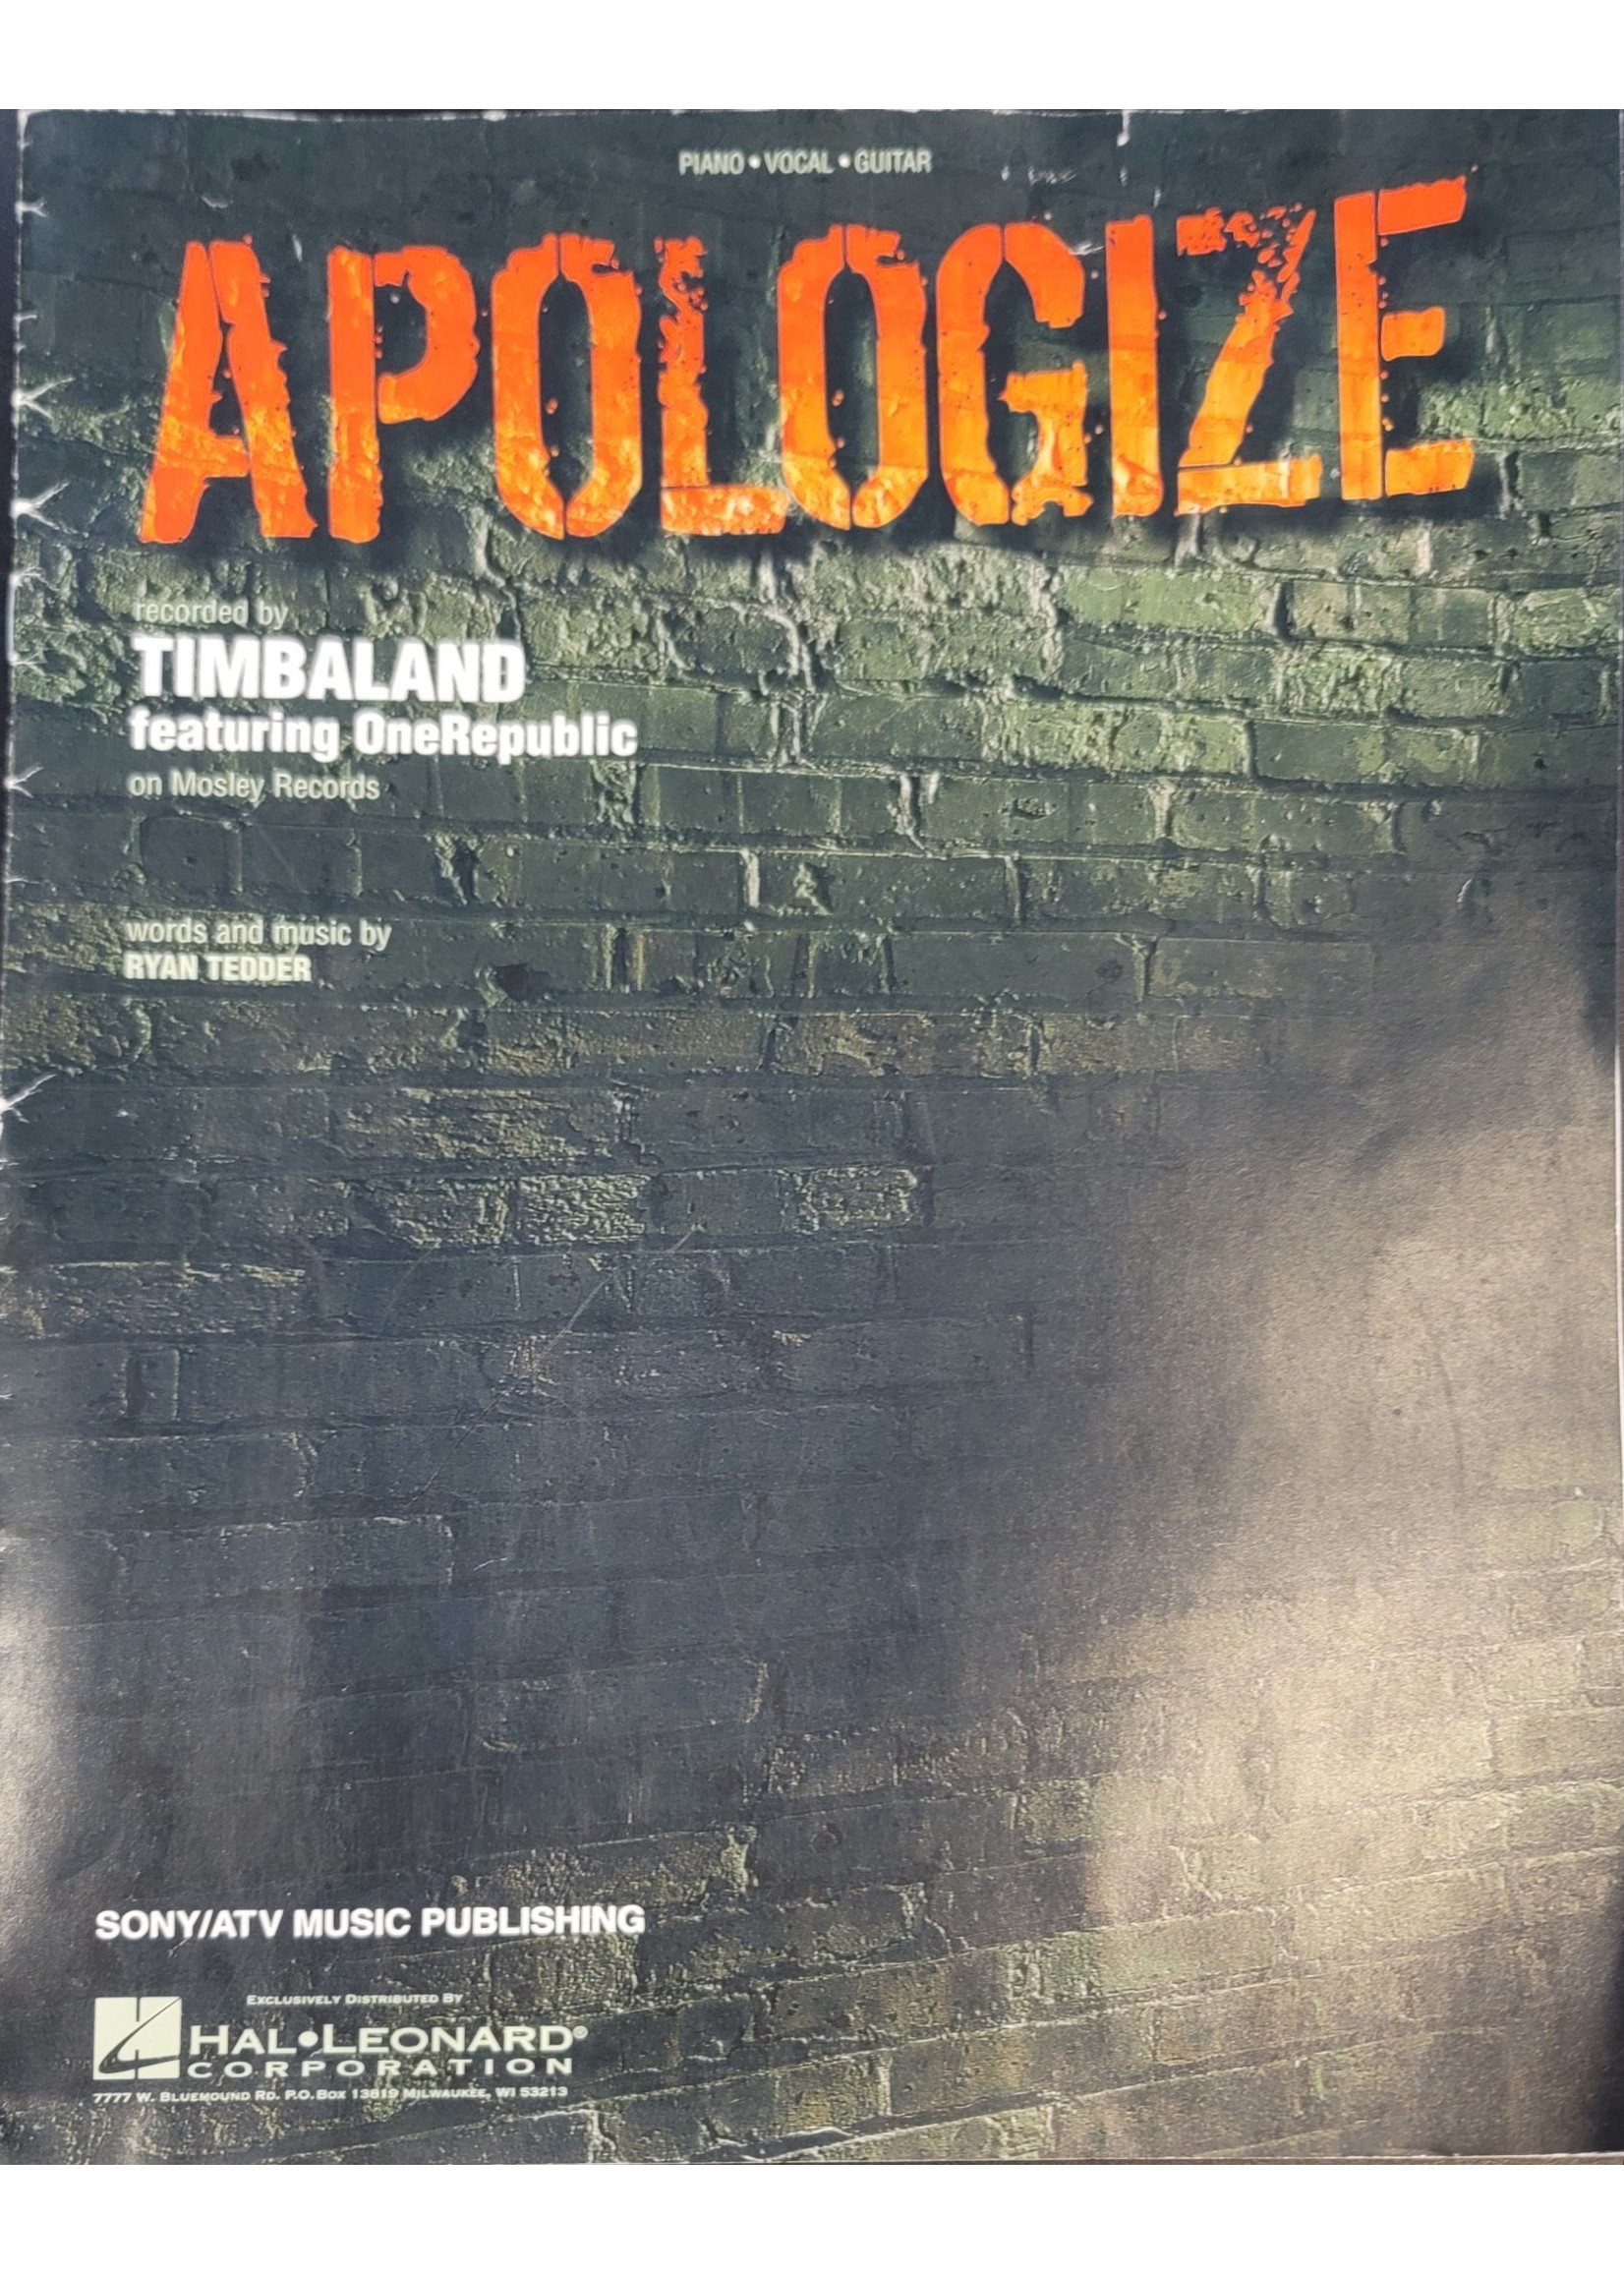 HAL LEONARD LIVRE APOLOGIZE/TIMBALAND-ONE REPUBLIC